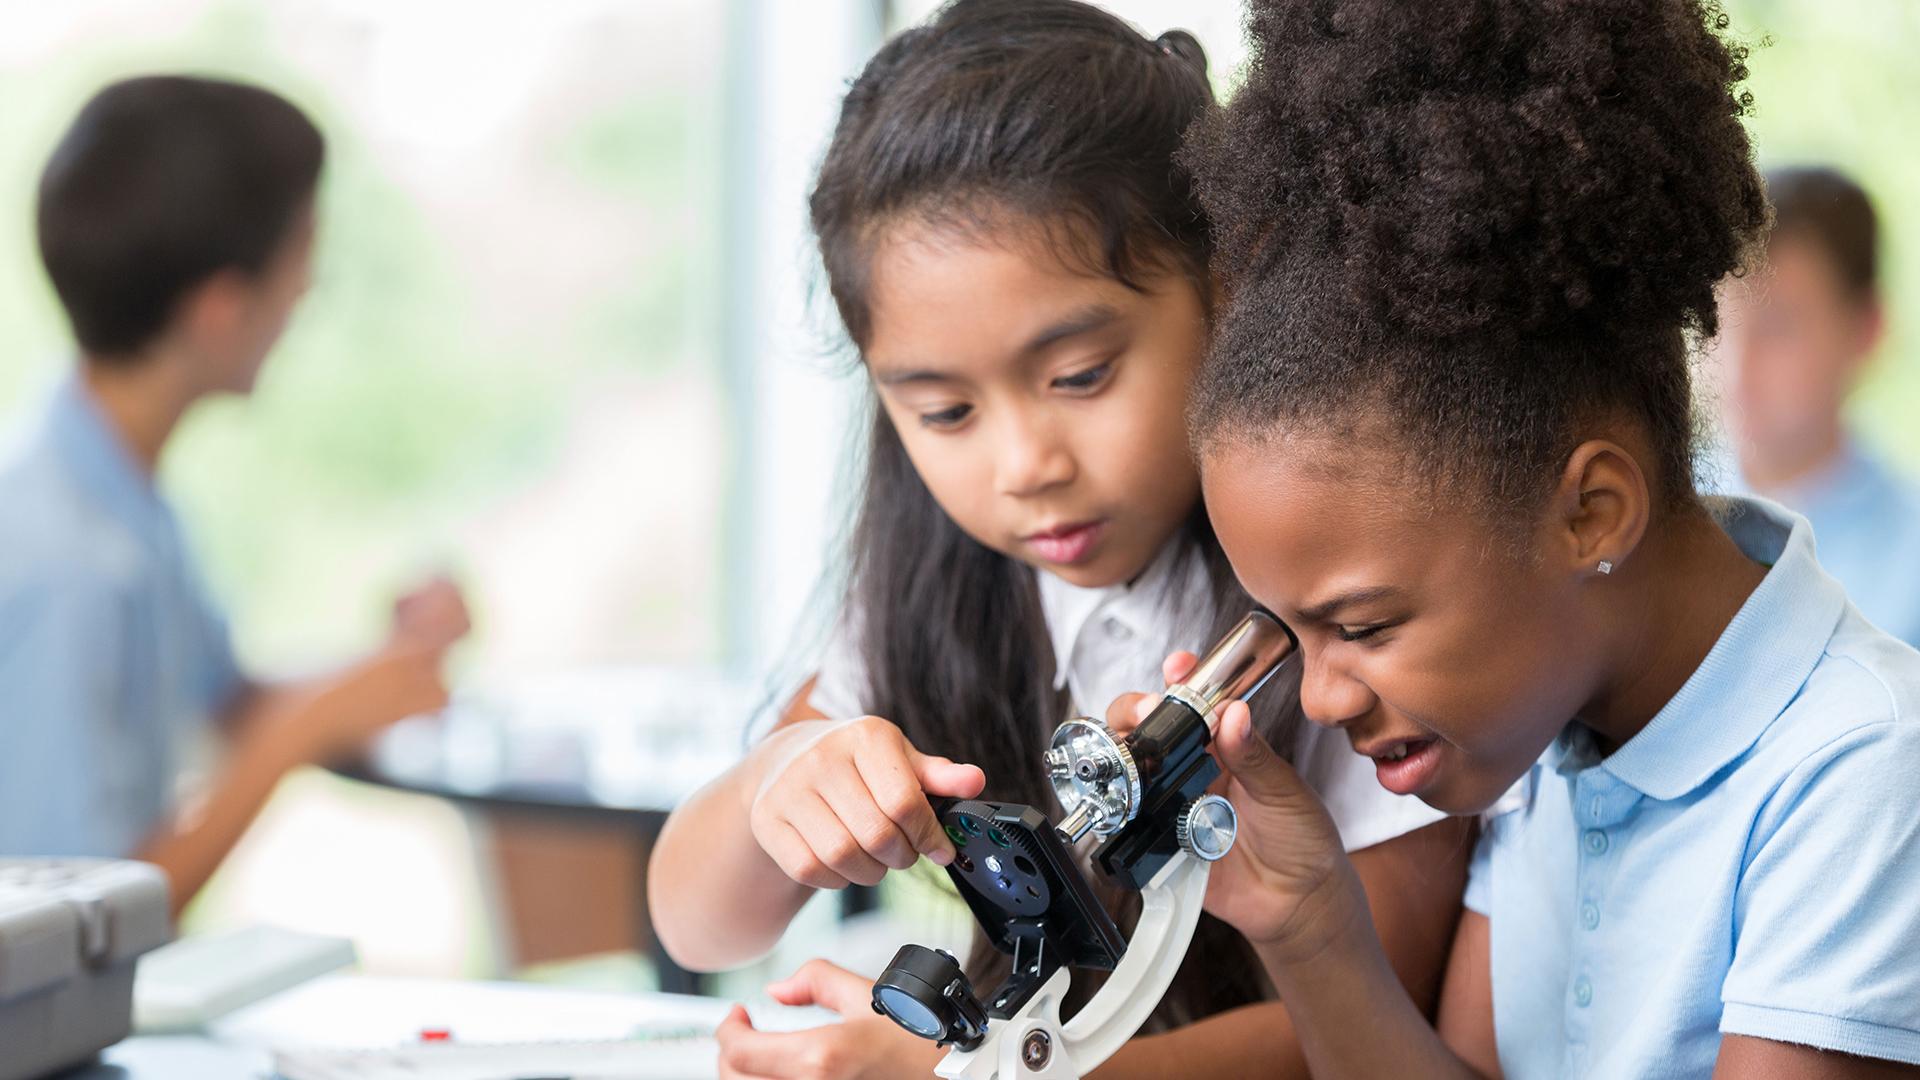 Children Looking Through Microscope